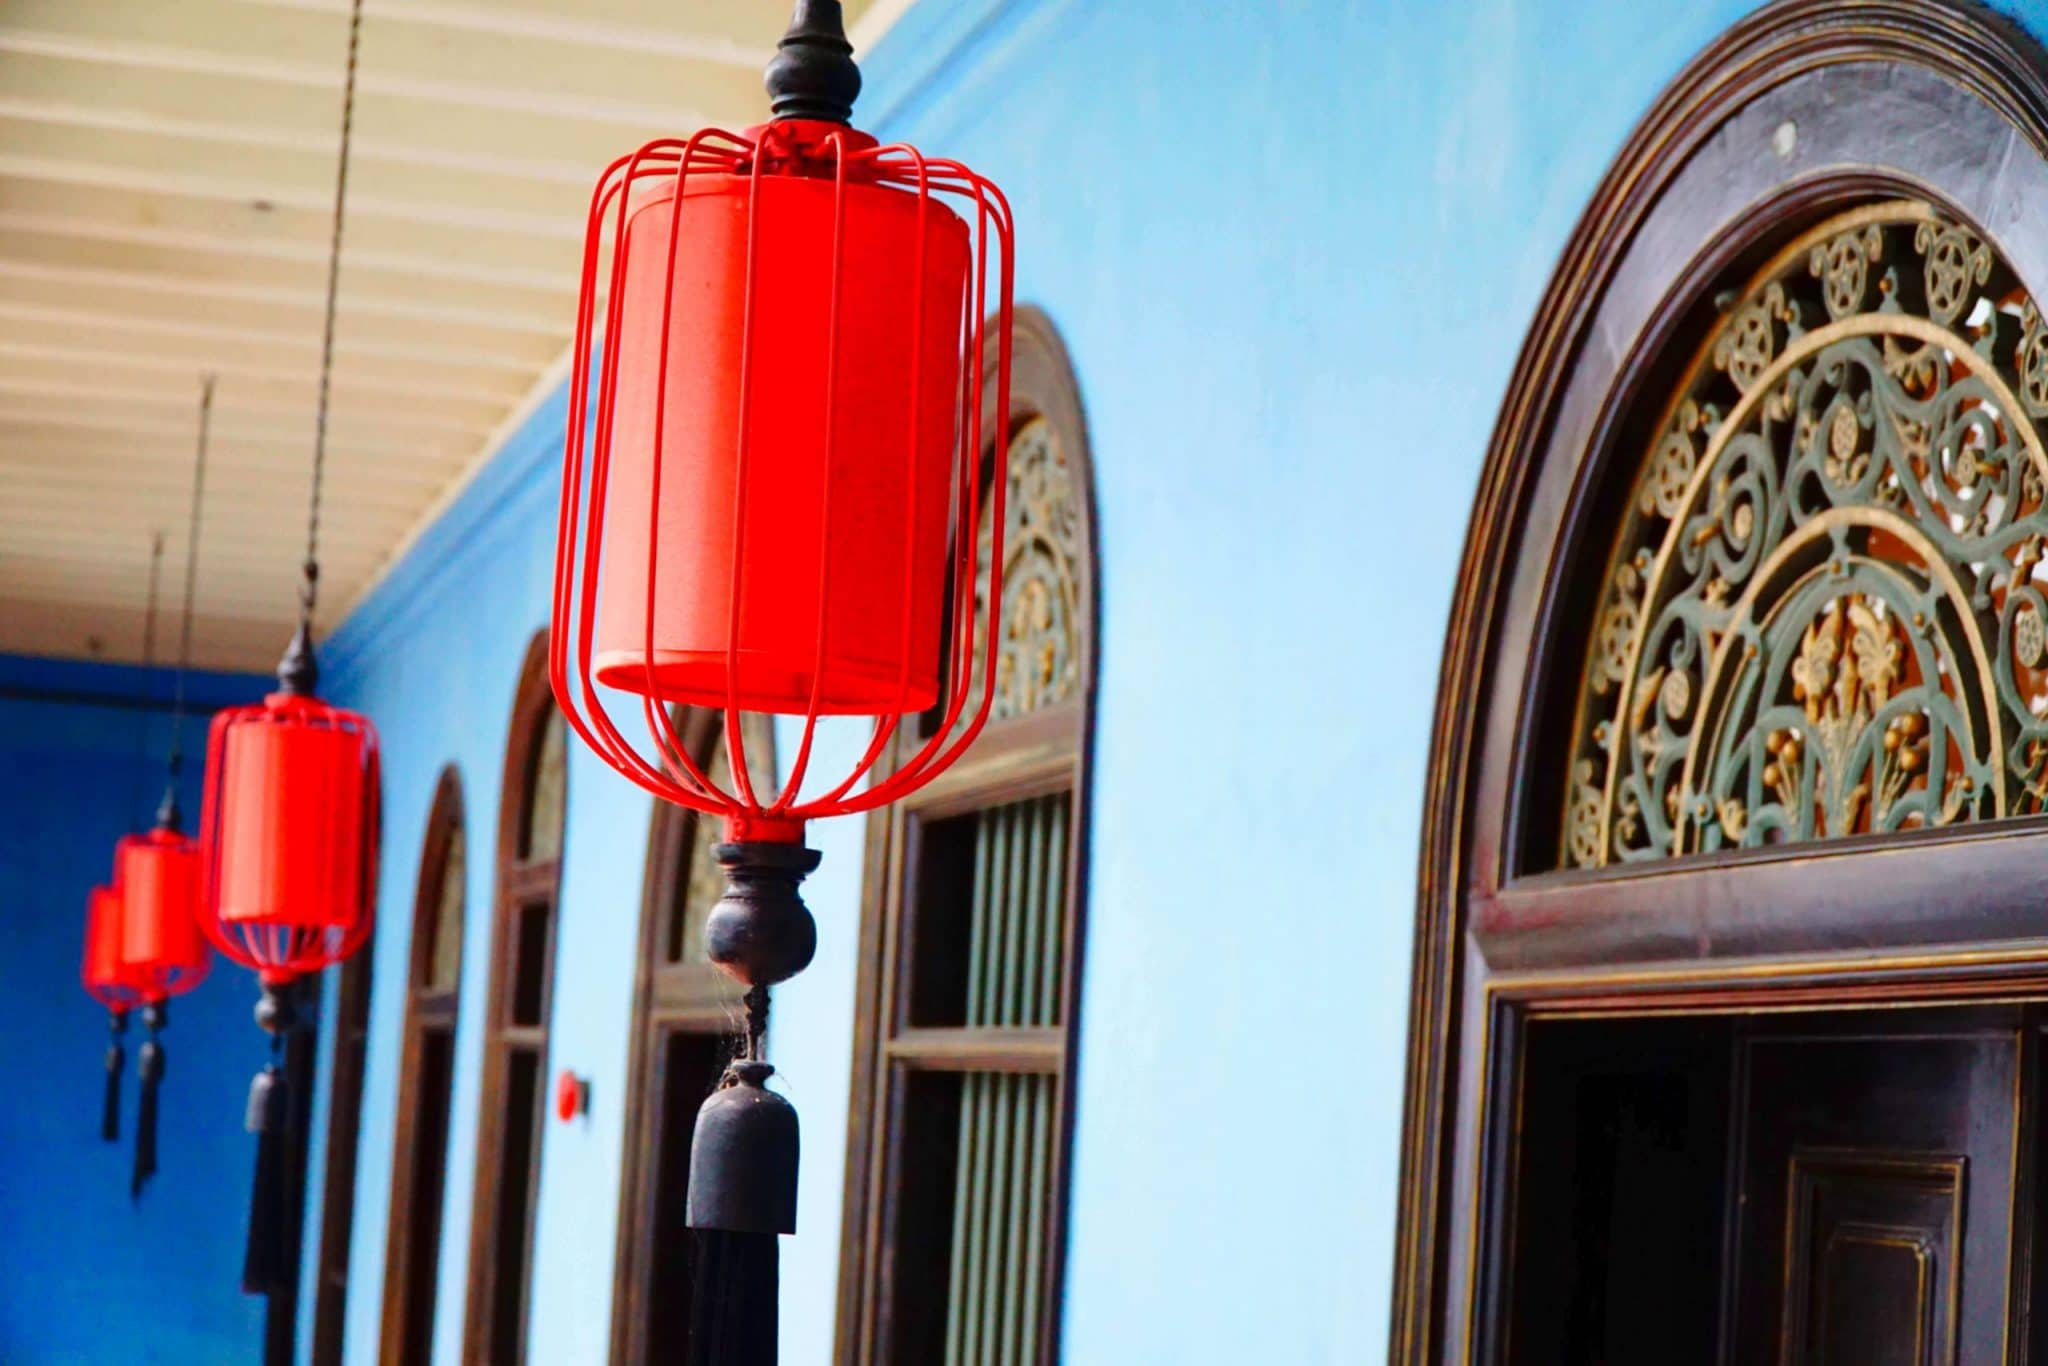 The Blue Mansion Penang